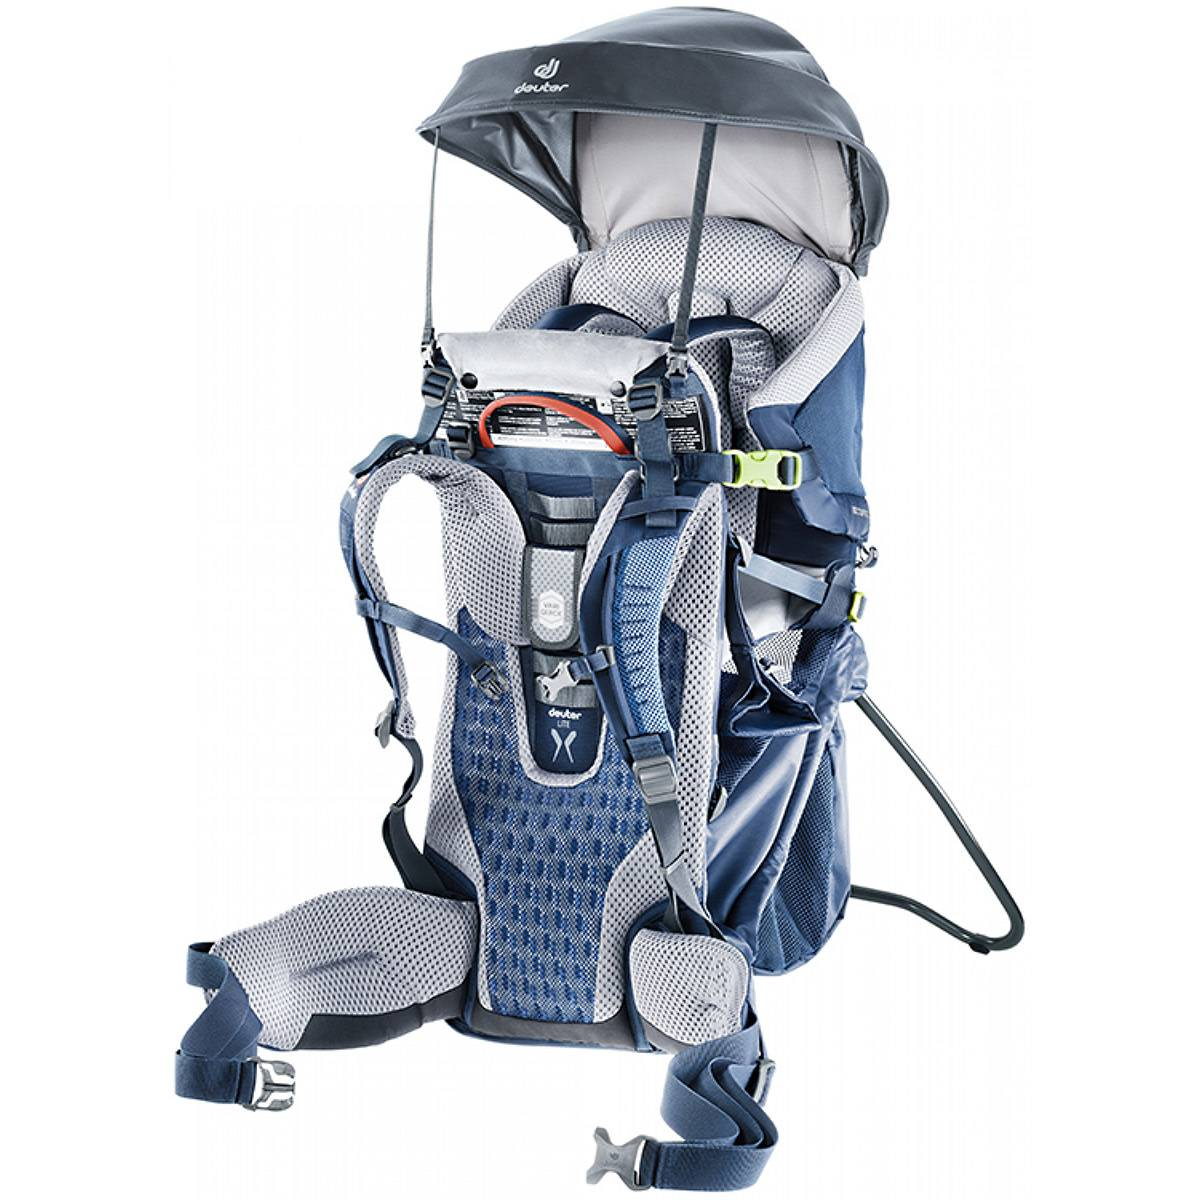 Deuter Kid Comfort Sunroof Pack Carrier Accessory